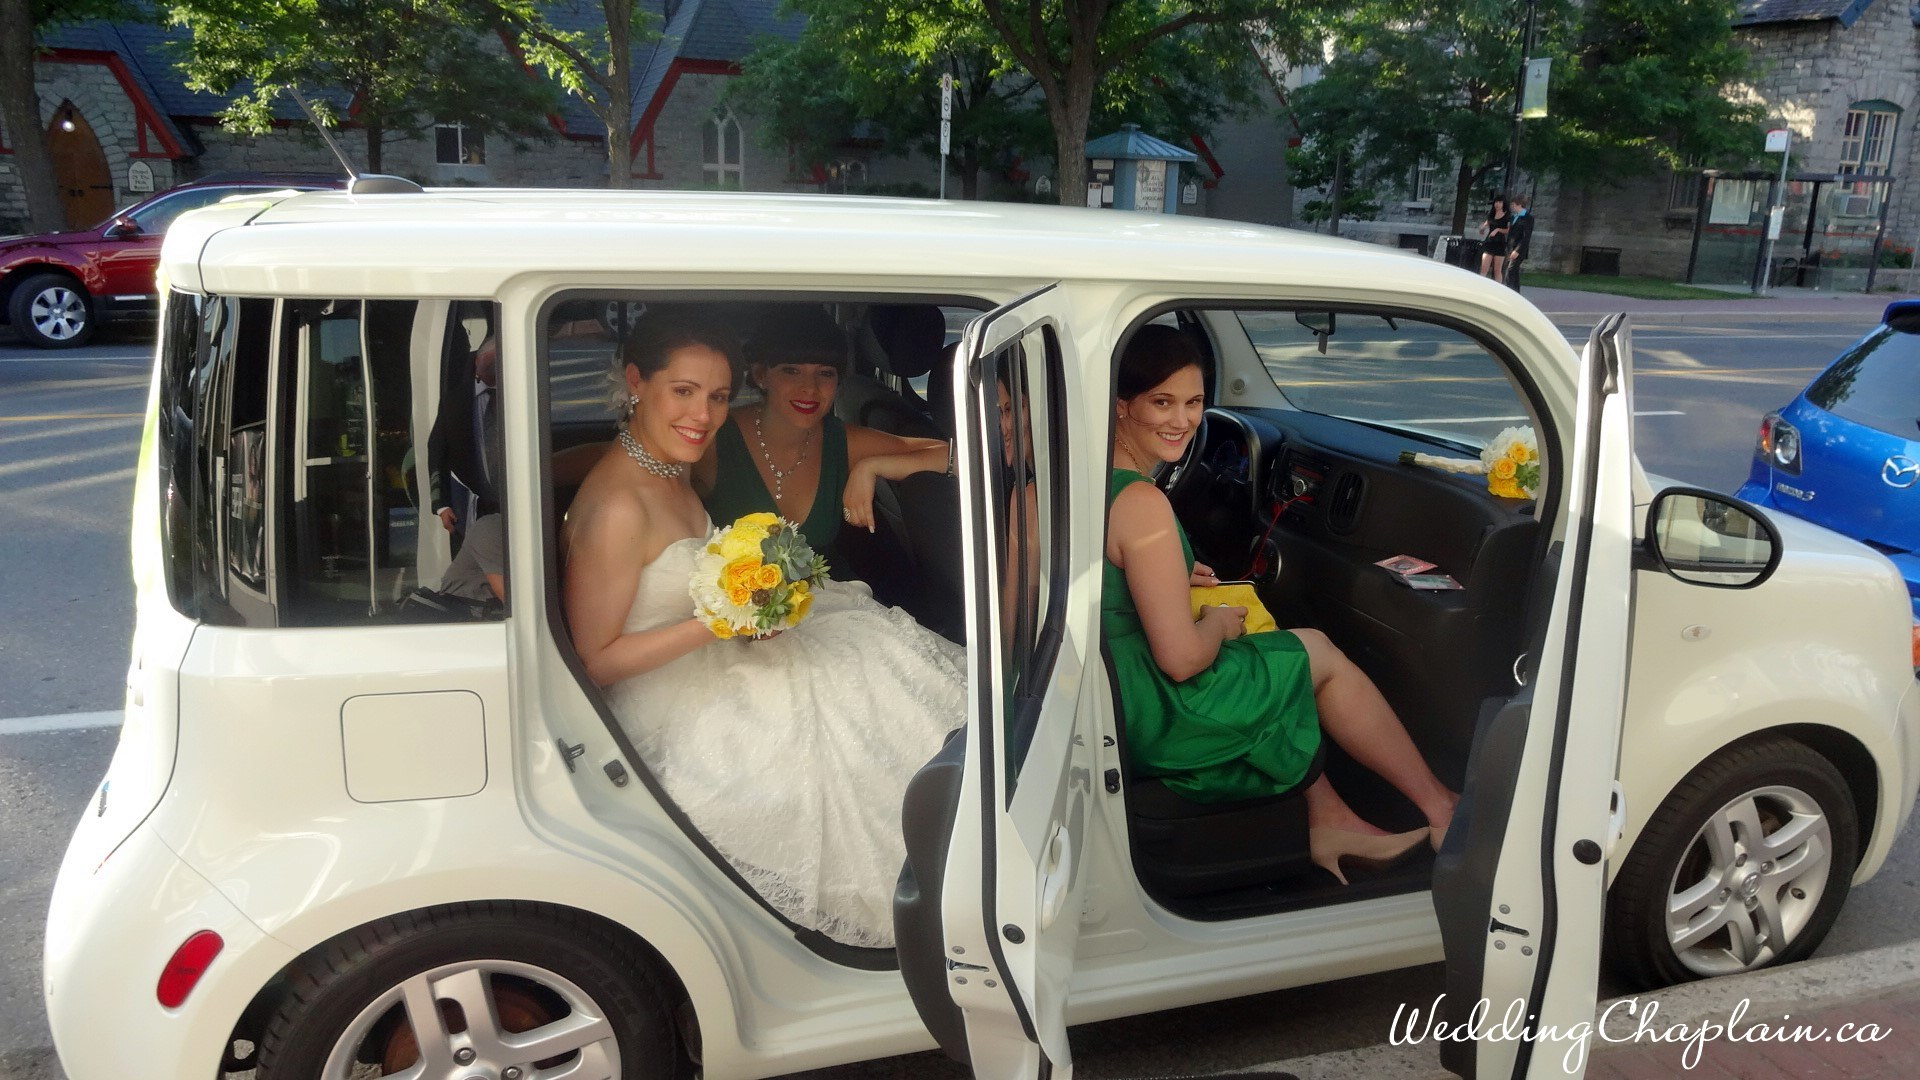 https://www.ottawaweddingmagazine.com/wp-content/uploads/2015/01/cube-transport.jpg